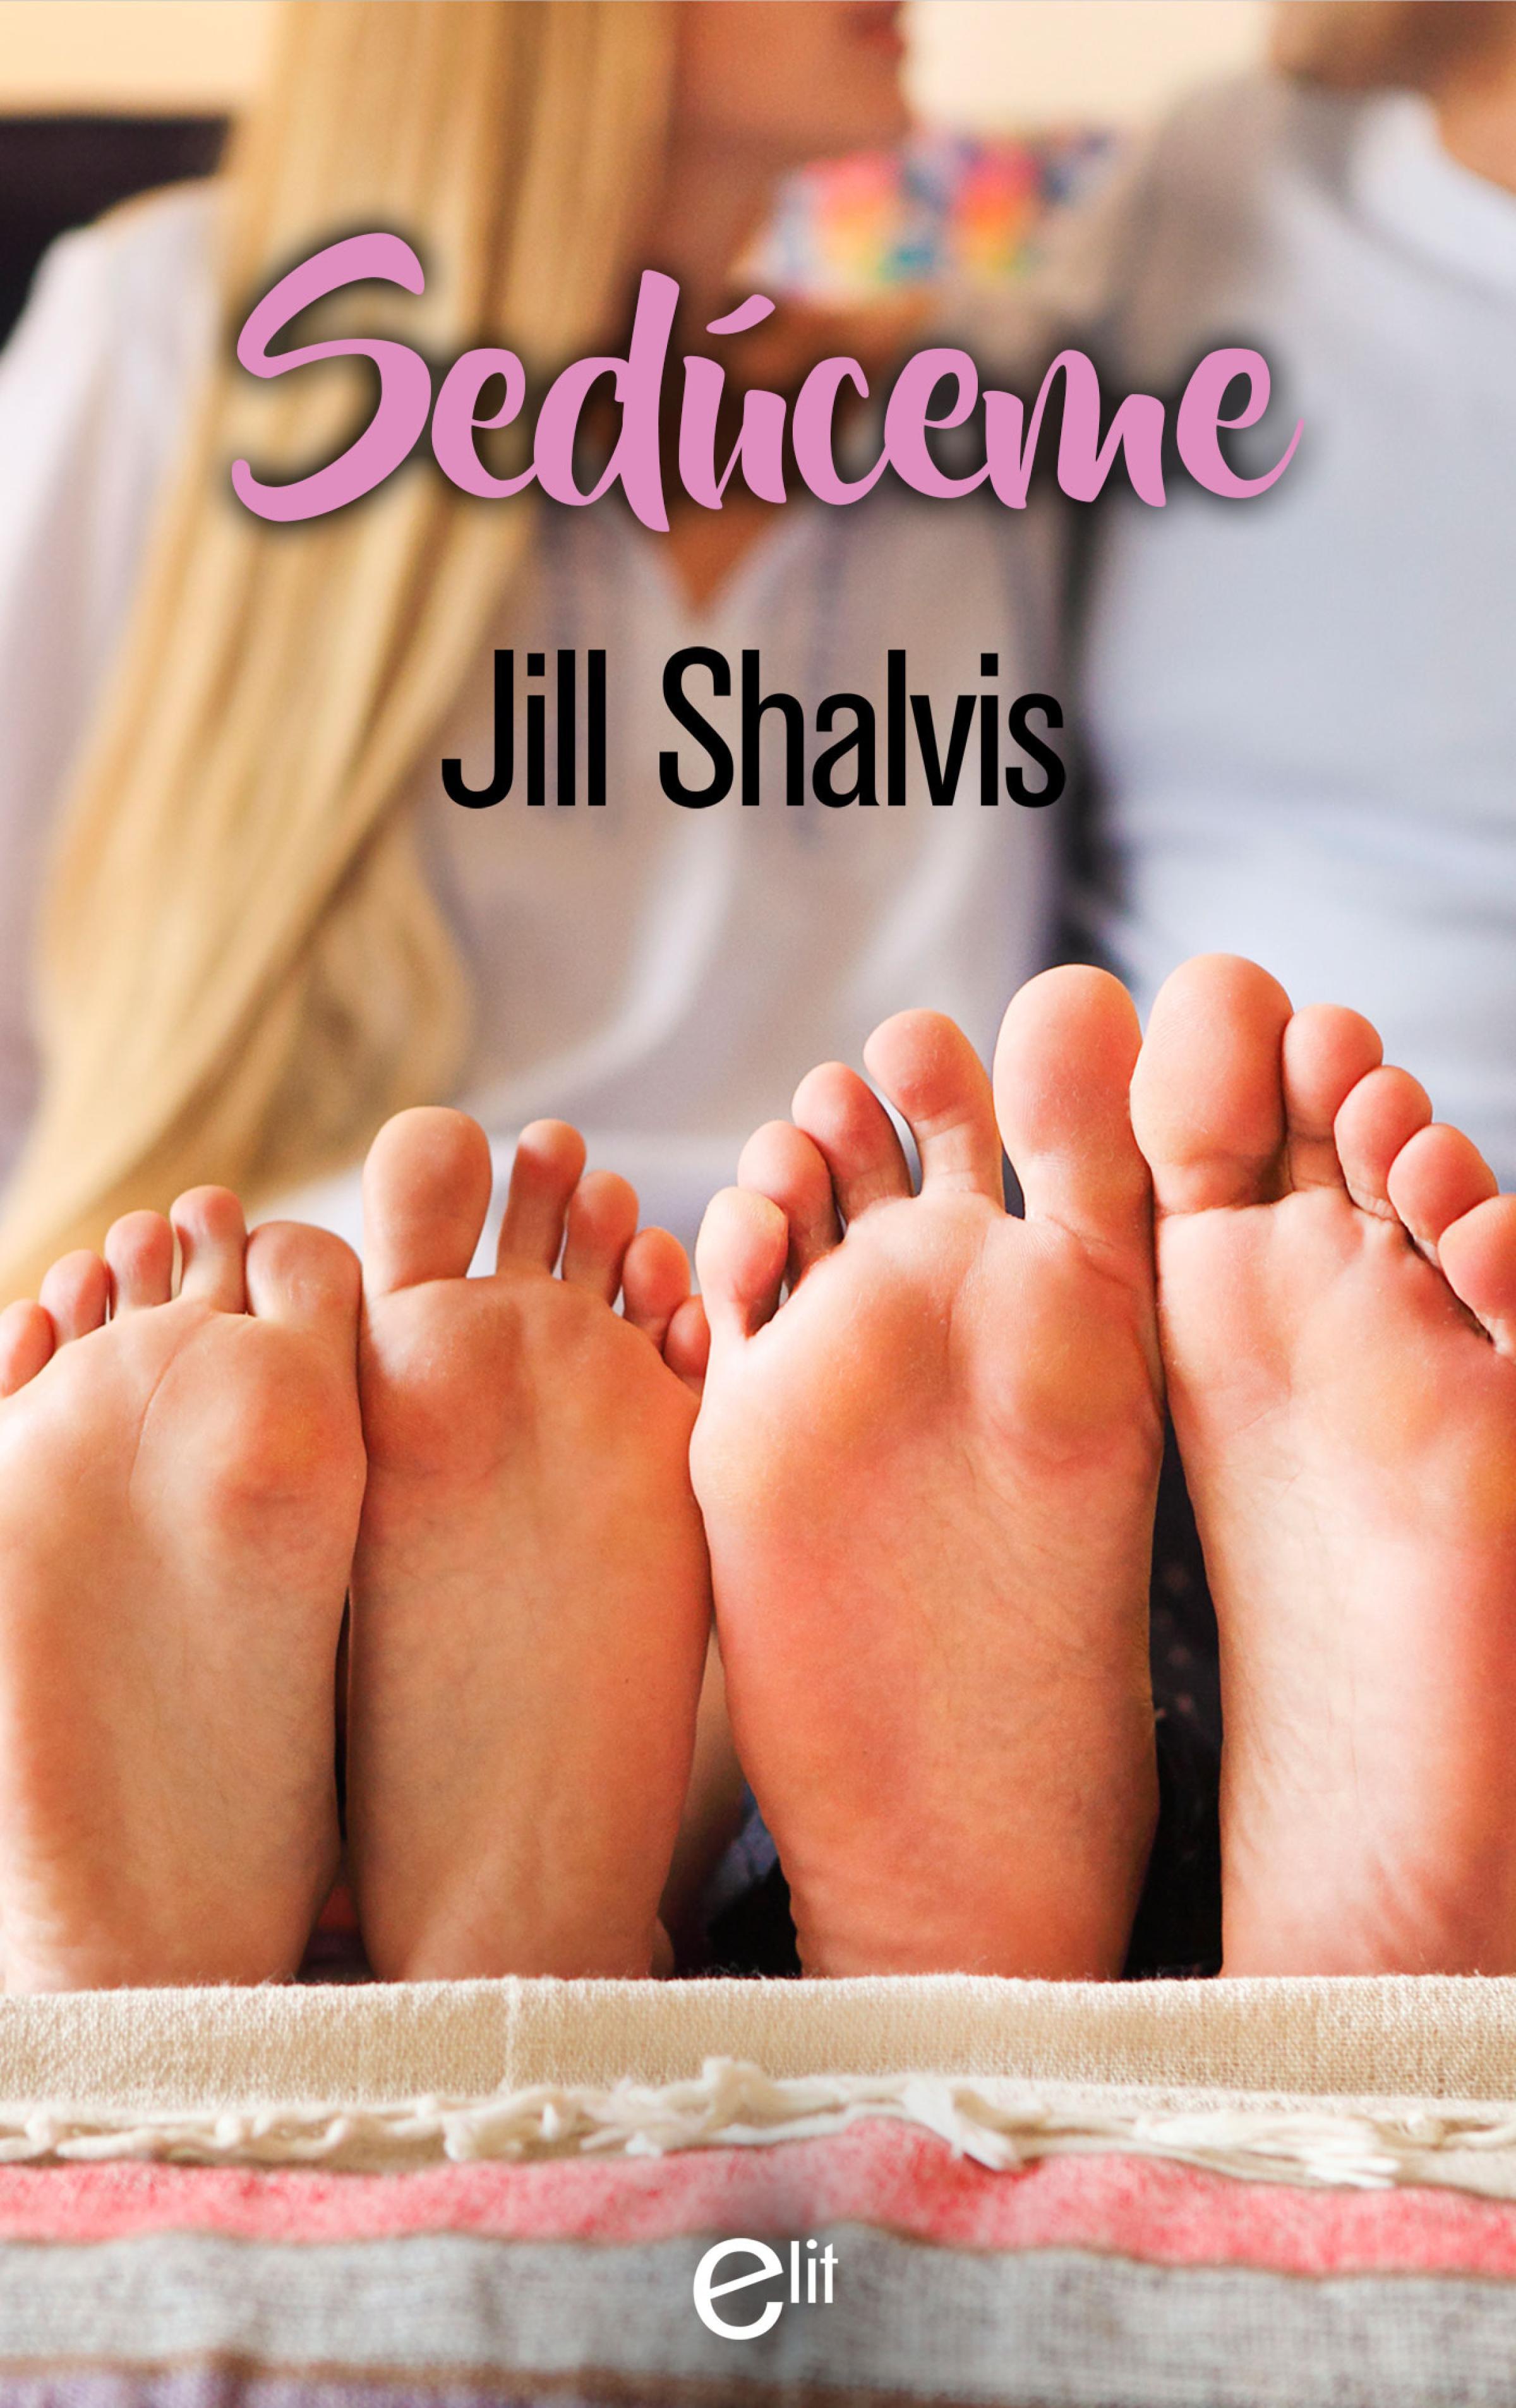 Jill Shalvis Sedúceme jill shalvis the rancher s surrender